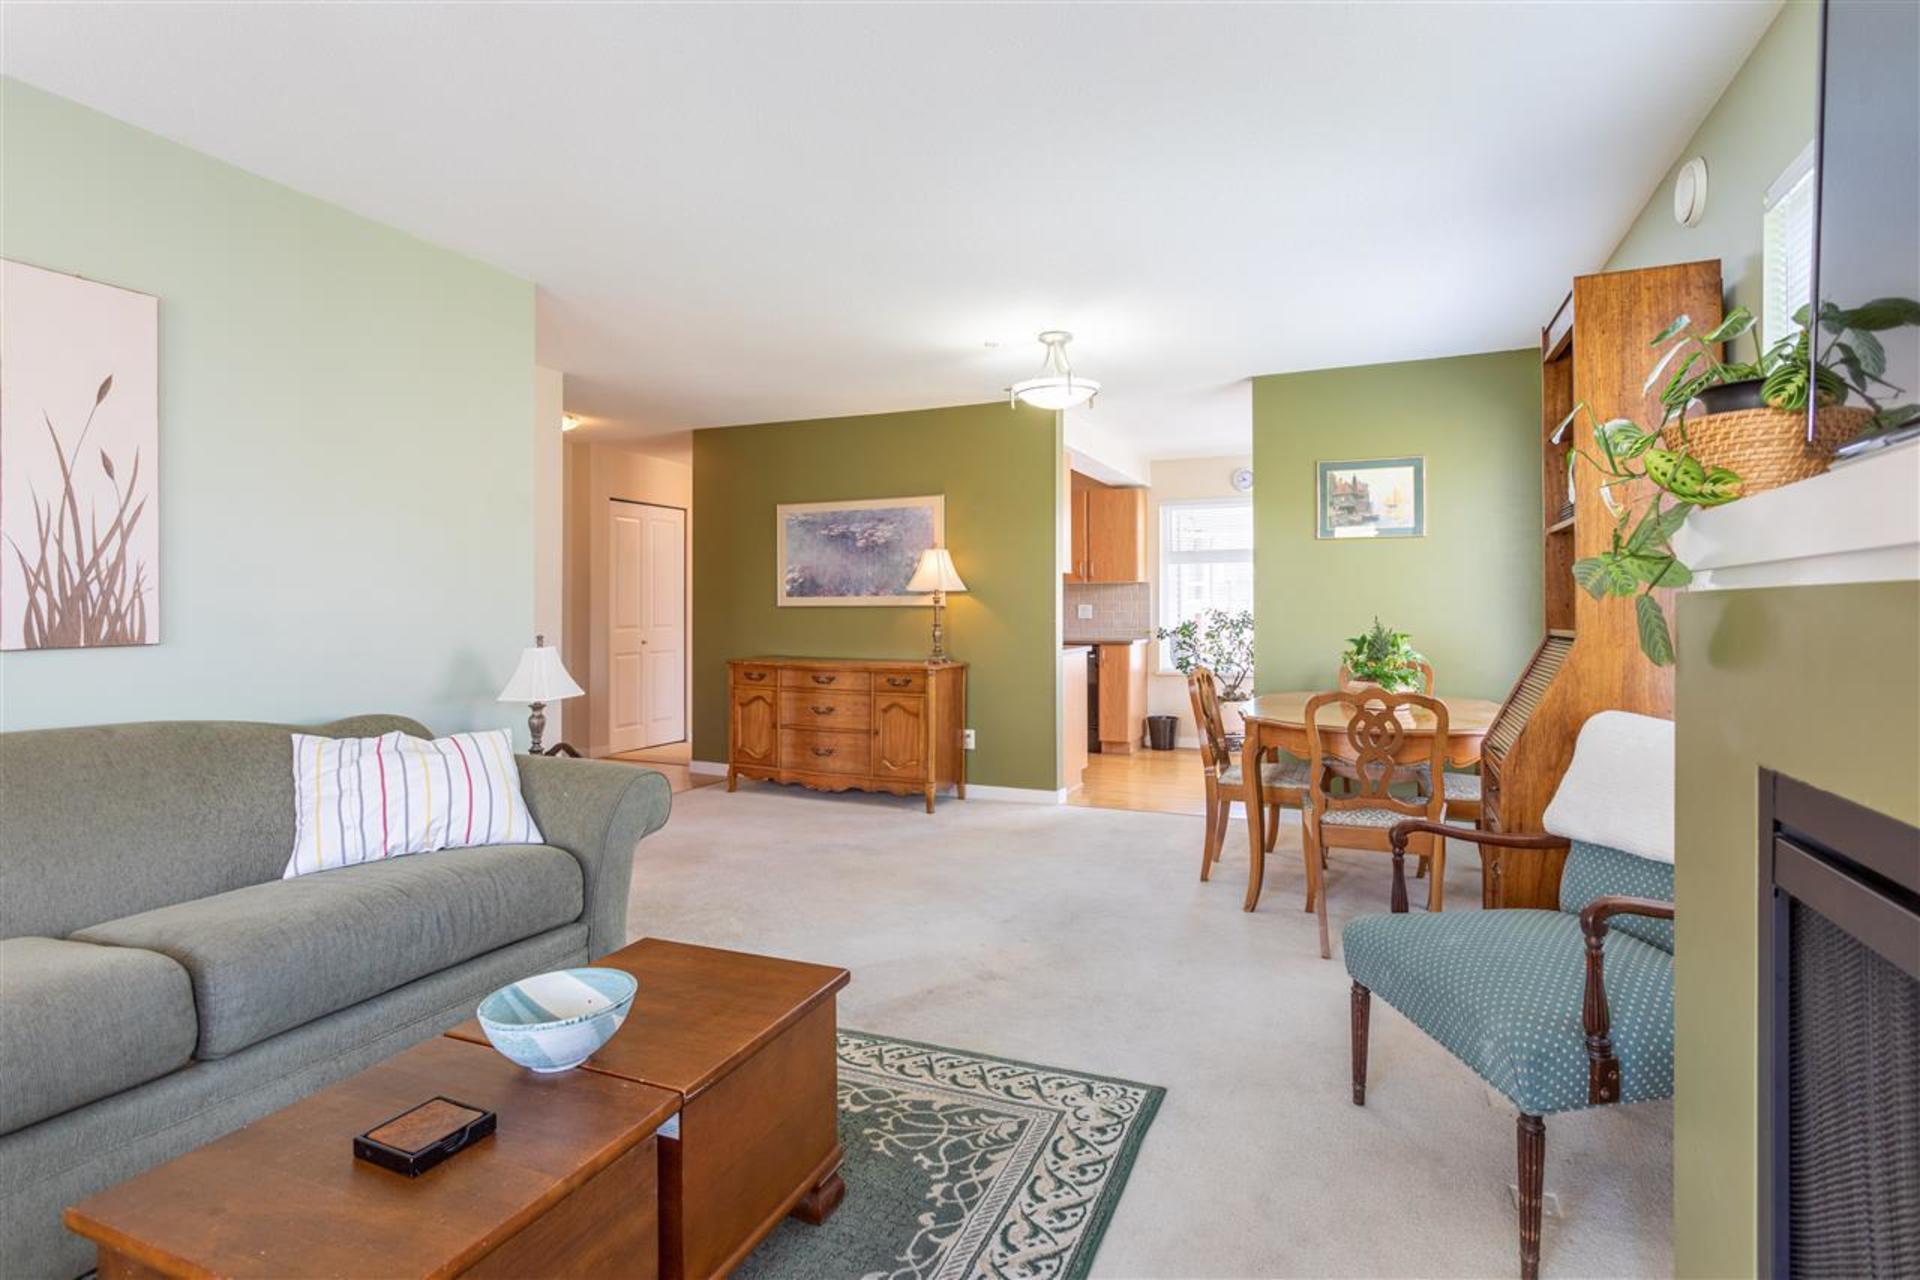 4783-dawson-street-brentwood-park-burnaby-north-06 at 316 - 4783 Dawson Street, Brentwood Park, Burnaby North